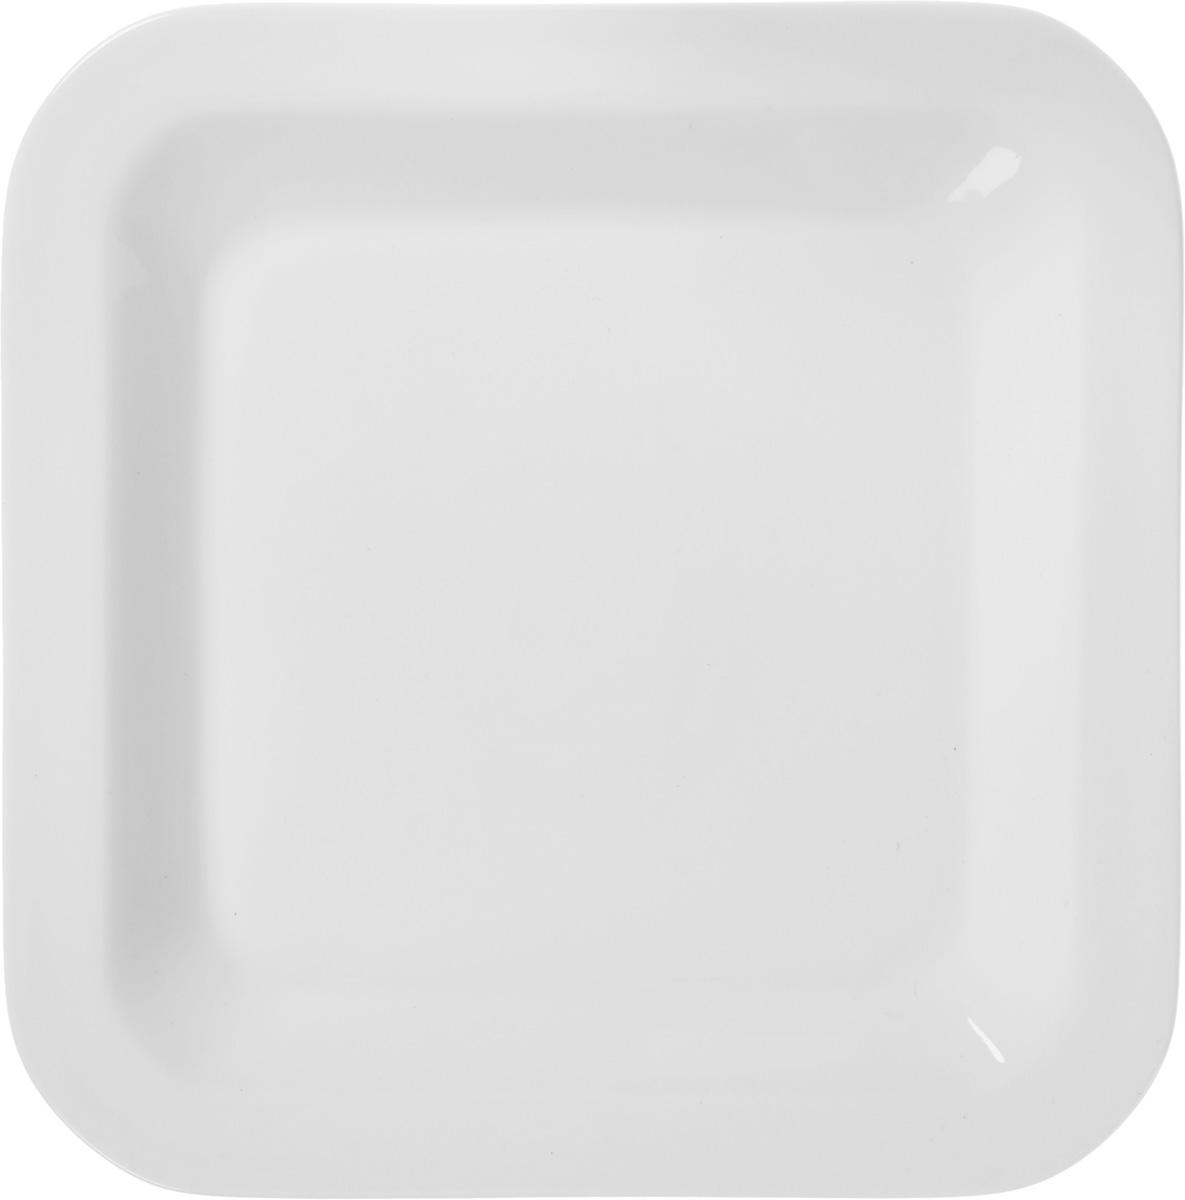 Тарелка десертная Tescoma Gustito, цвет: белый, 20 х 20см тарелка tescoma gustito 27 х 27 см